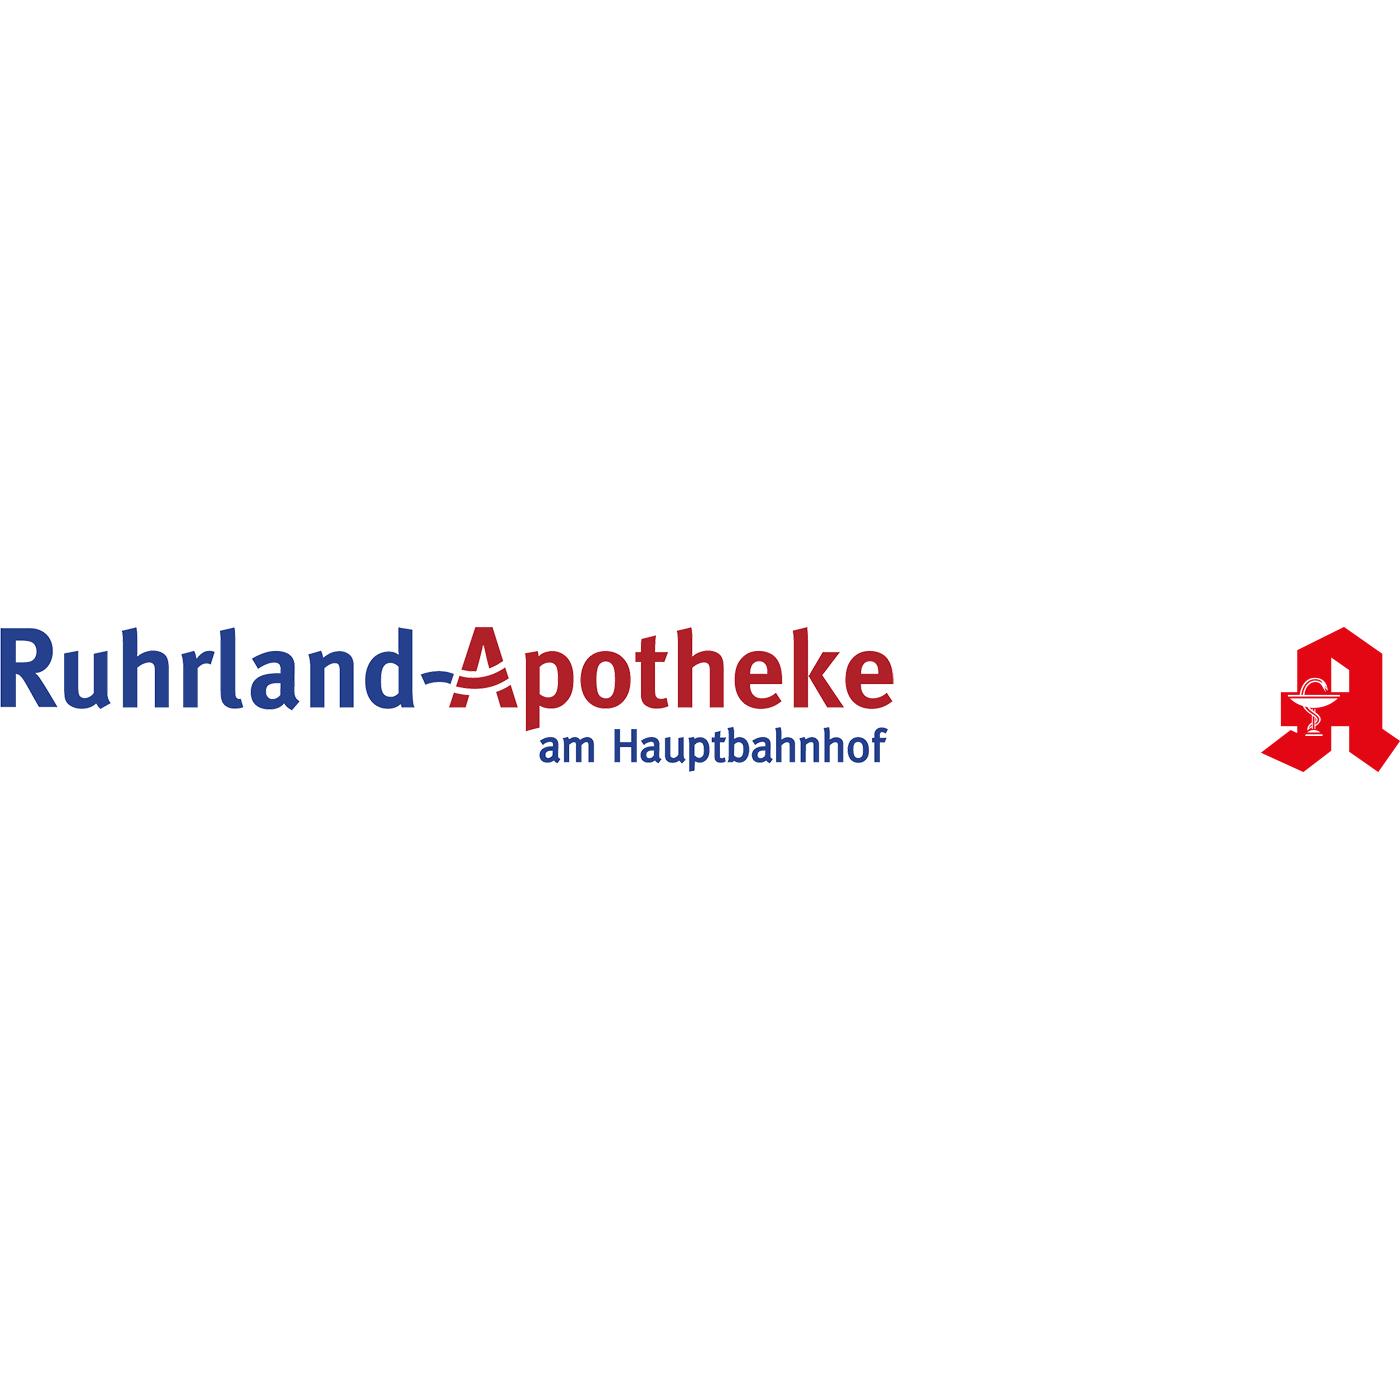 Logo der Ruhrland-Apotheke am Hbf.